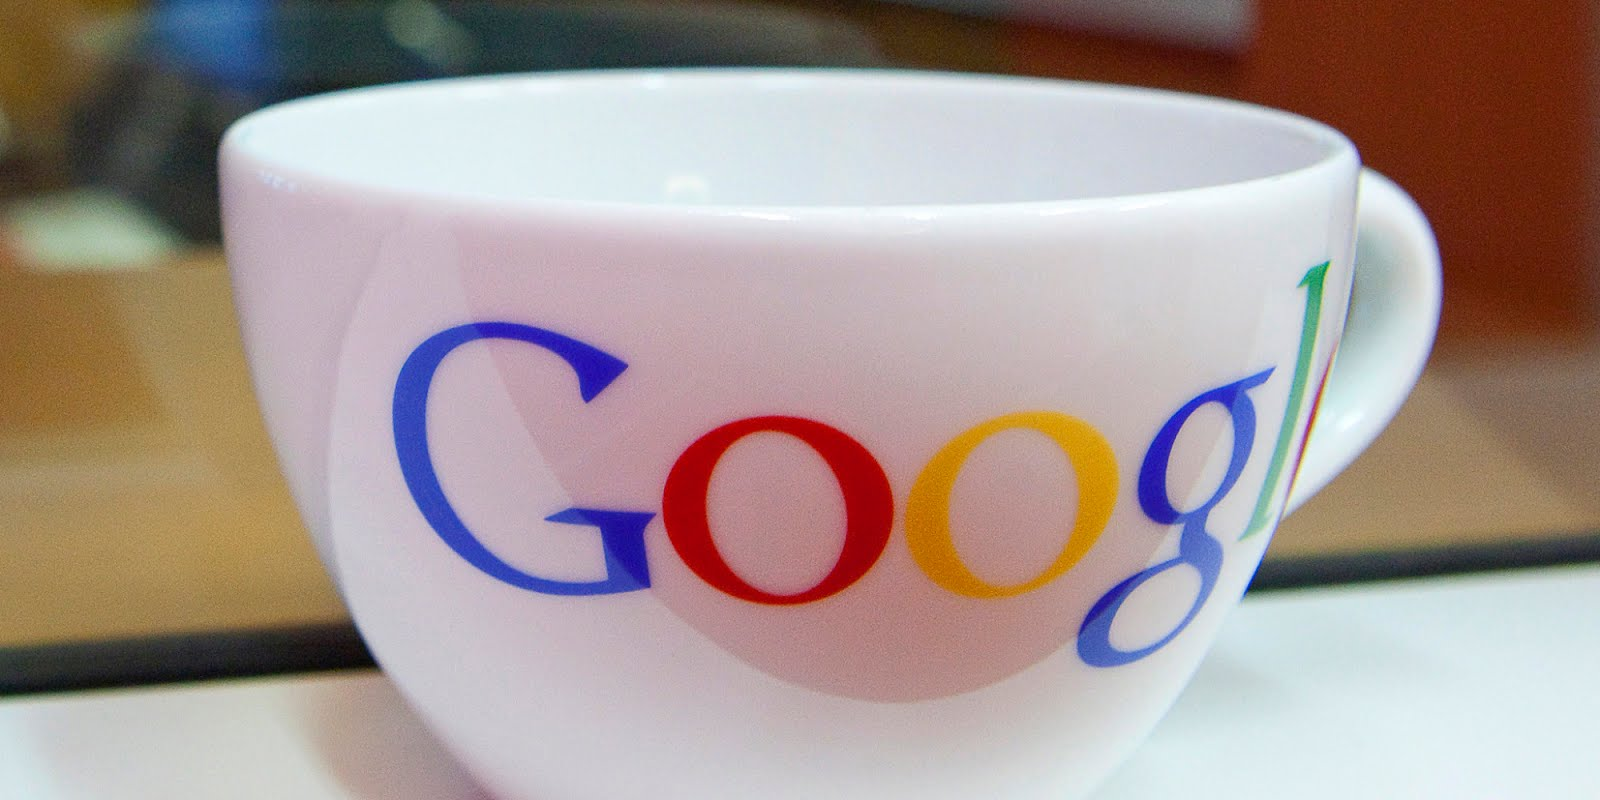 Google - Technology - Tecnologia